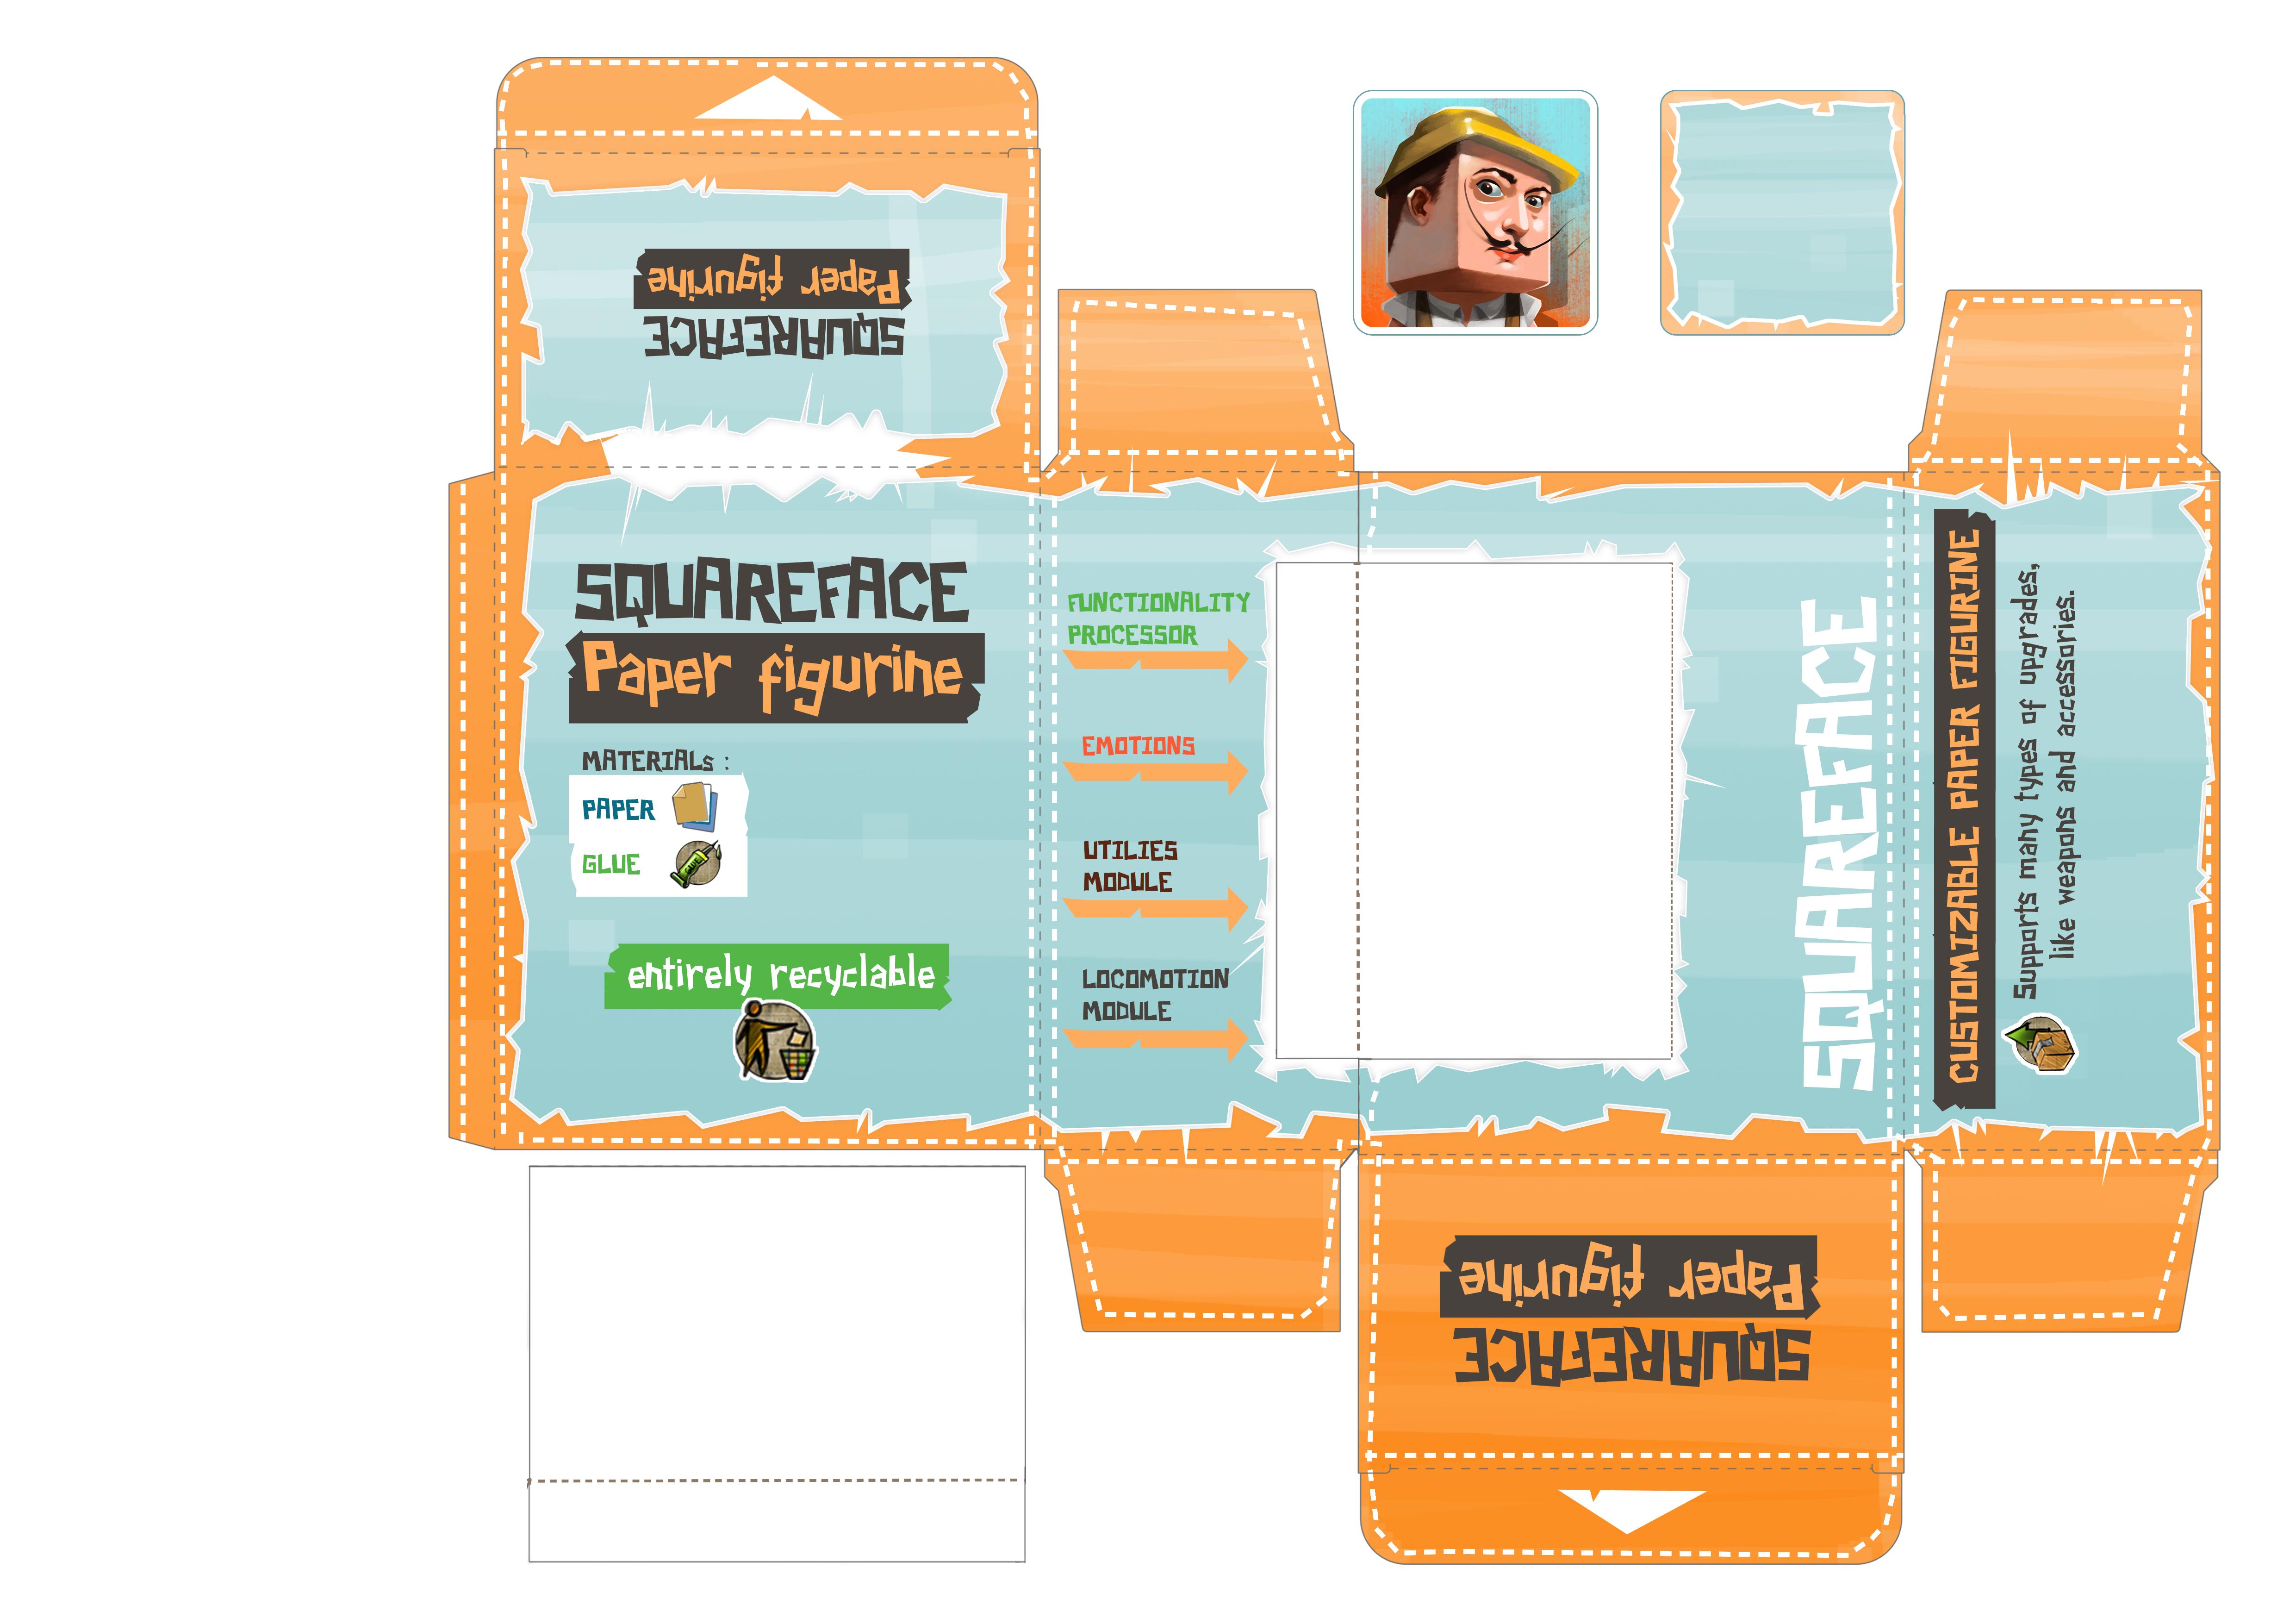 SquarefaceFigBOX A3